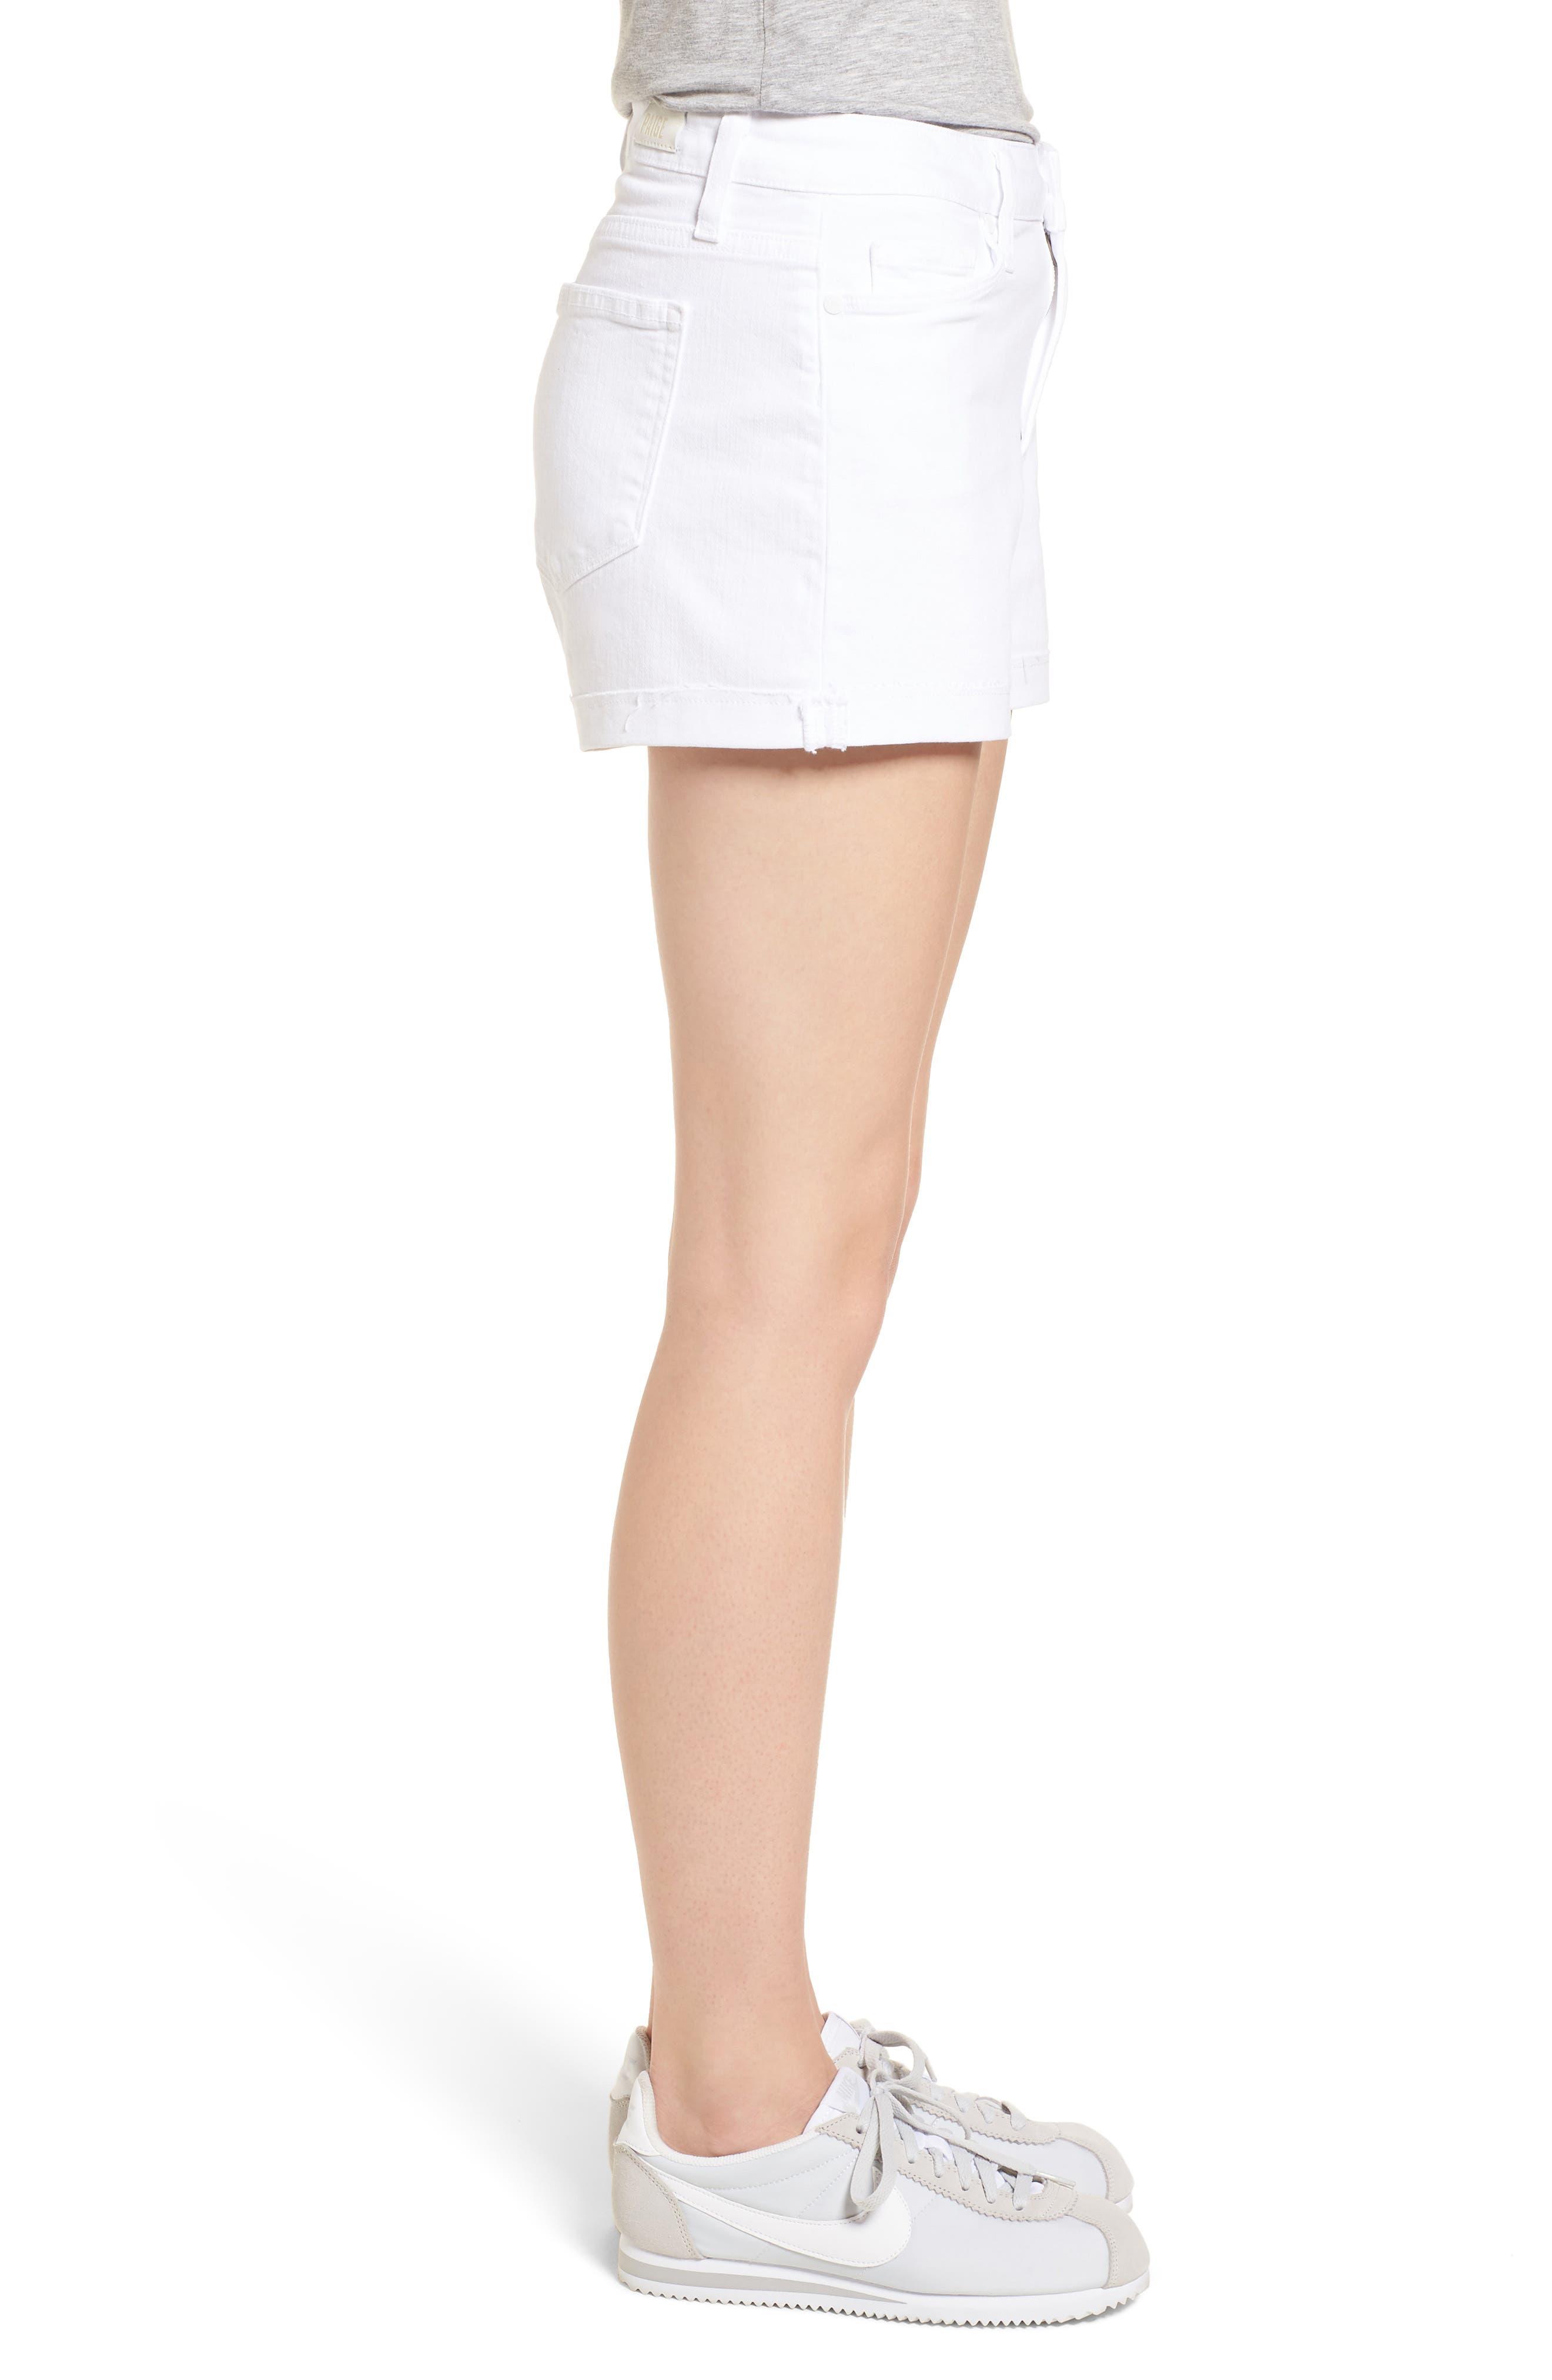 Jimmy Jimmy High Waist Denim Shorts,                             Alternate thumbnail 3, color,                             Crisp White